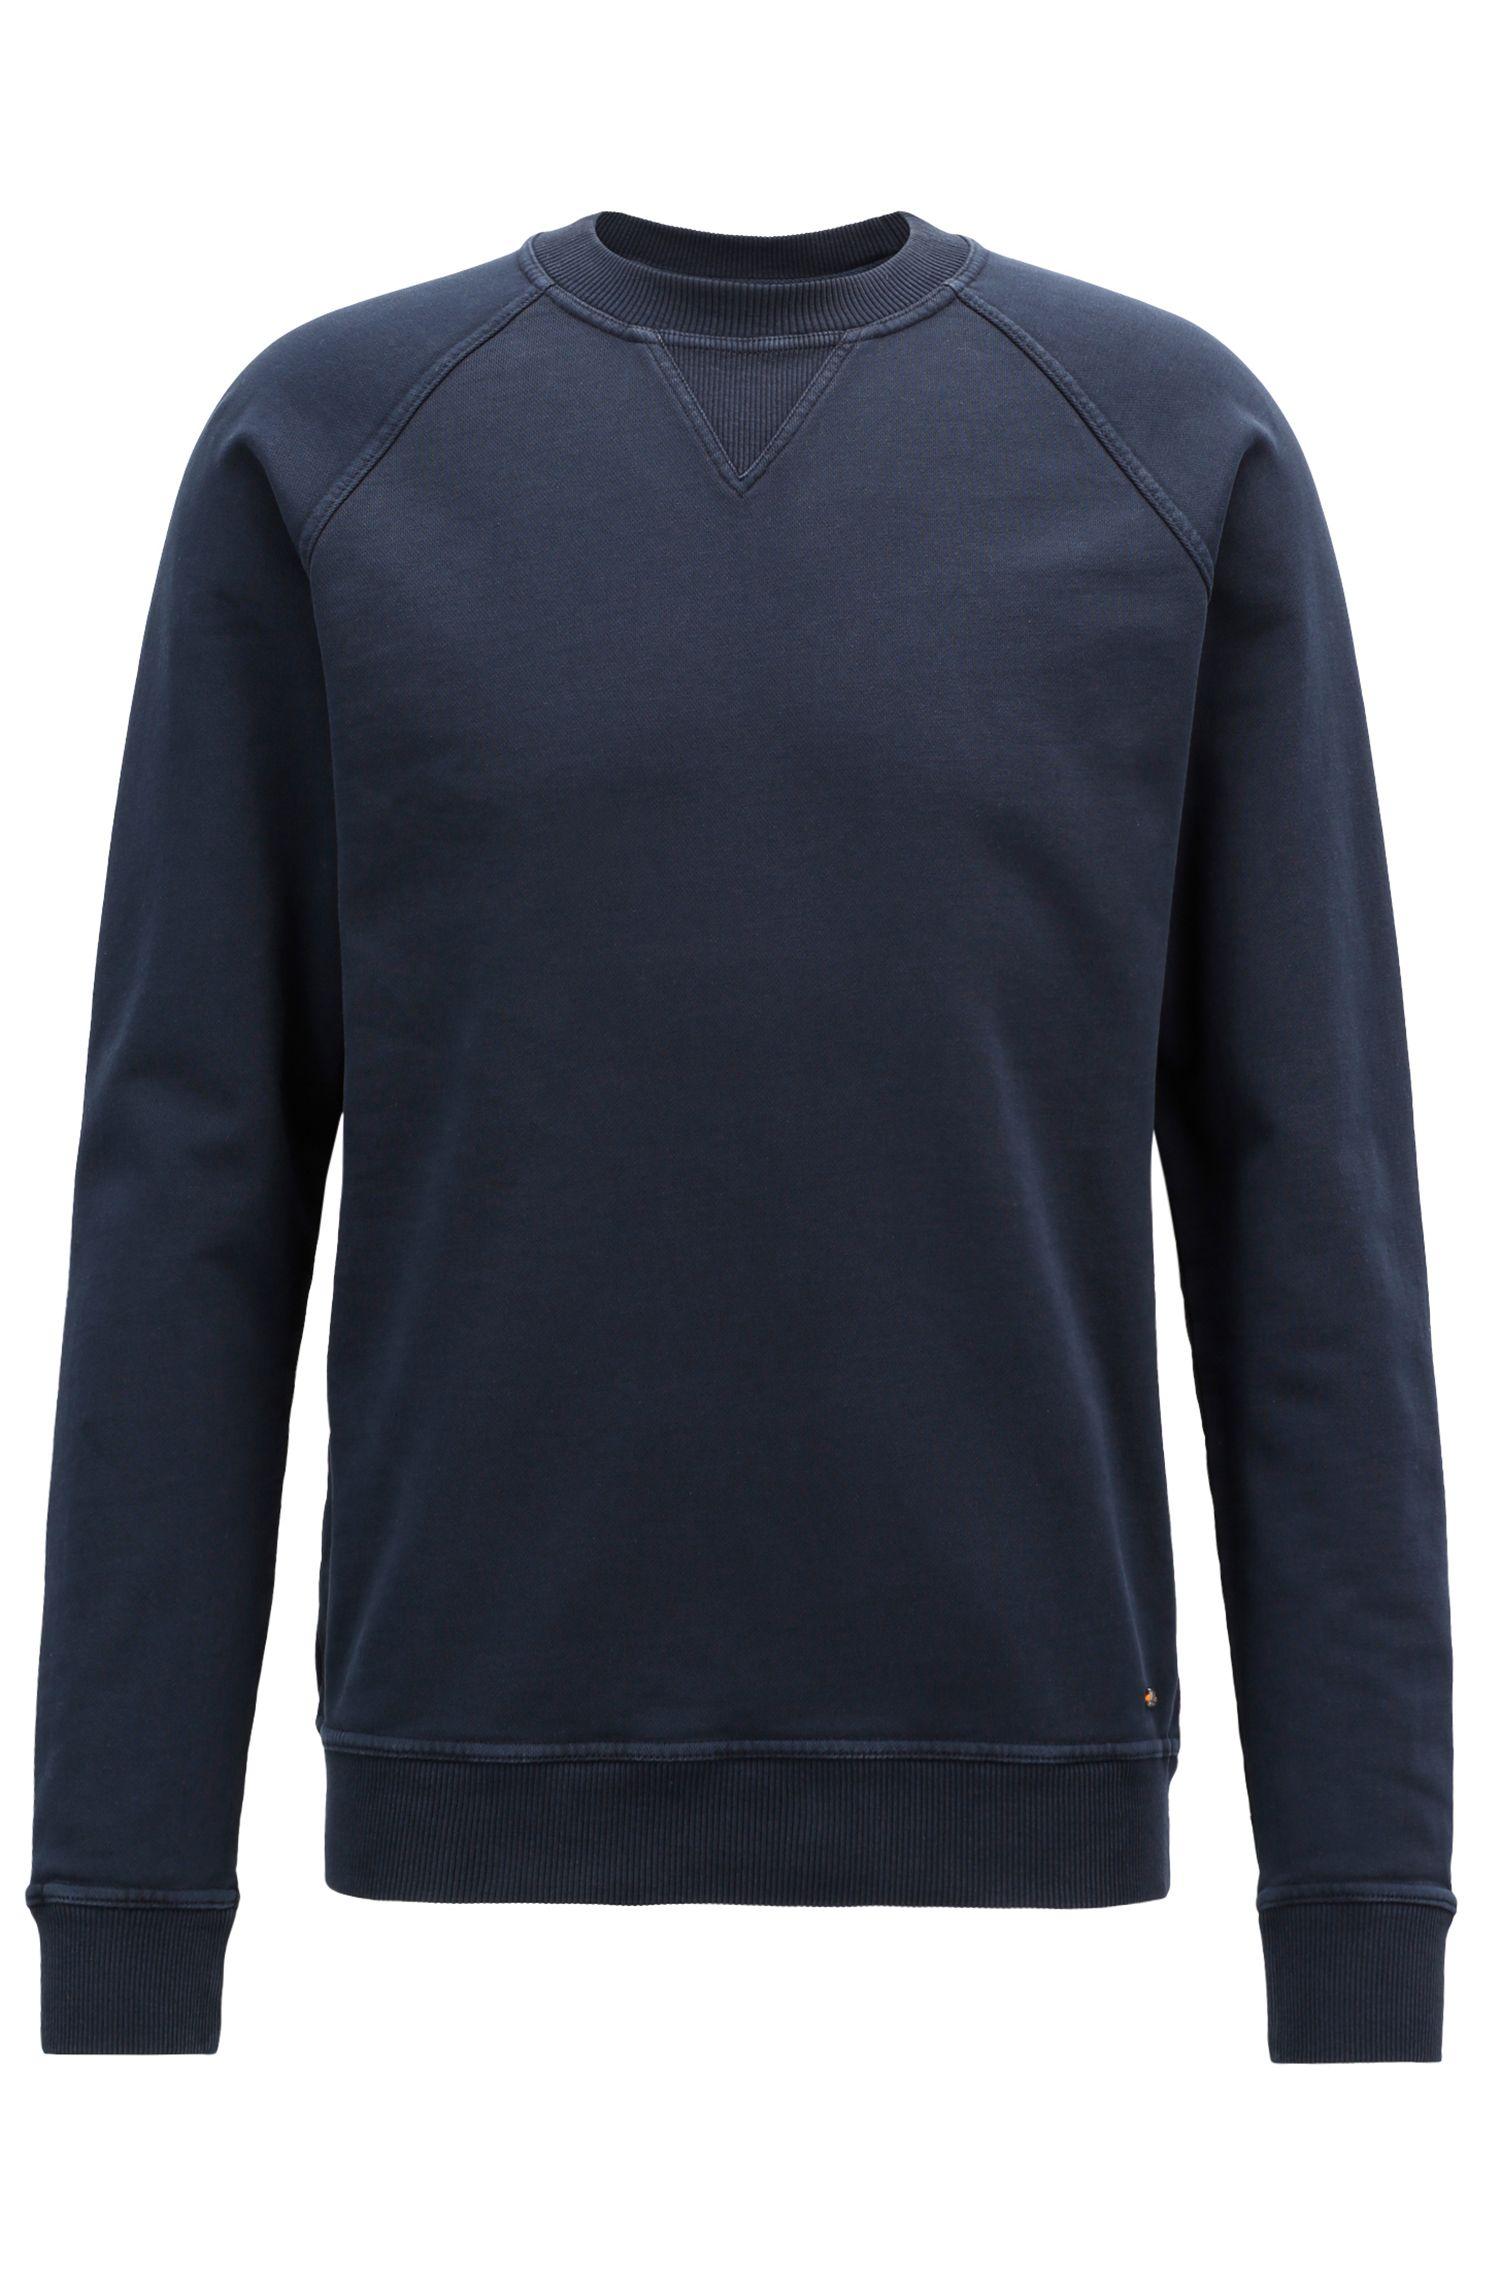 Crew-neck sweatshirt in recot²® French terry